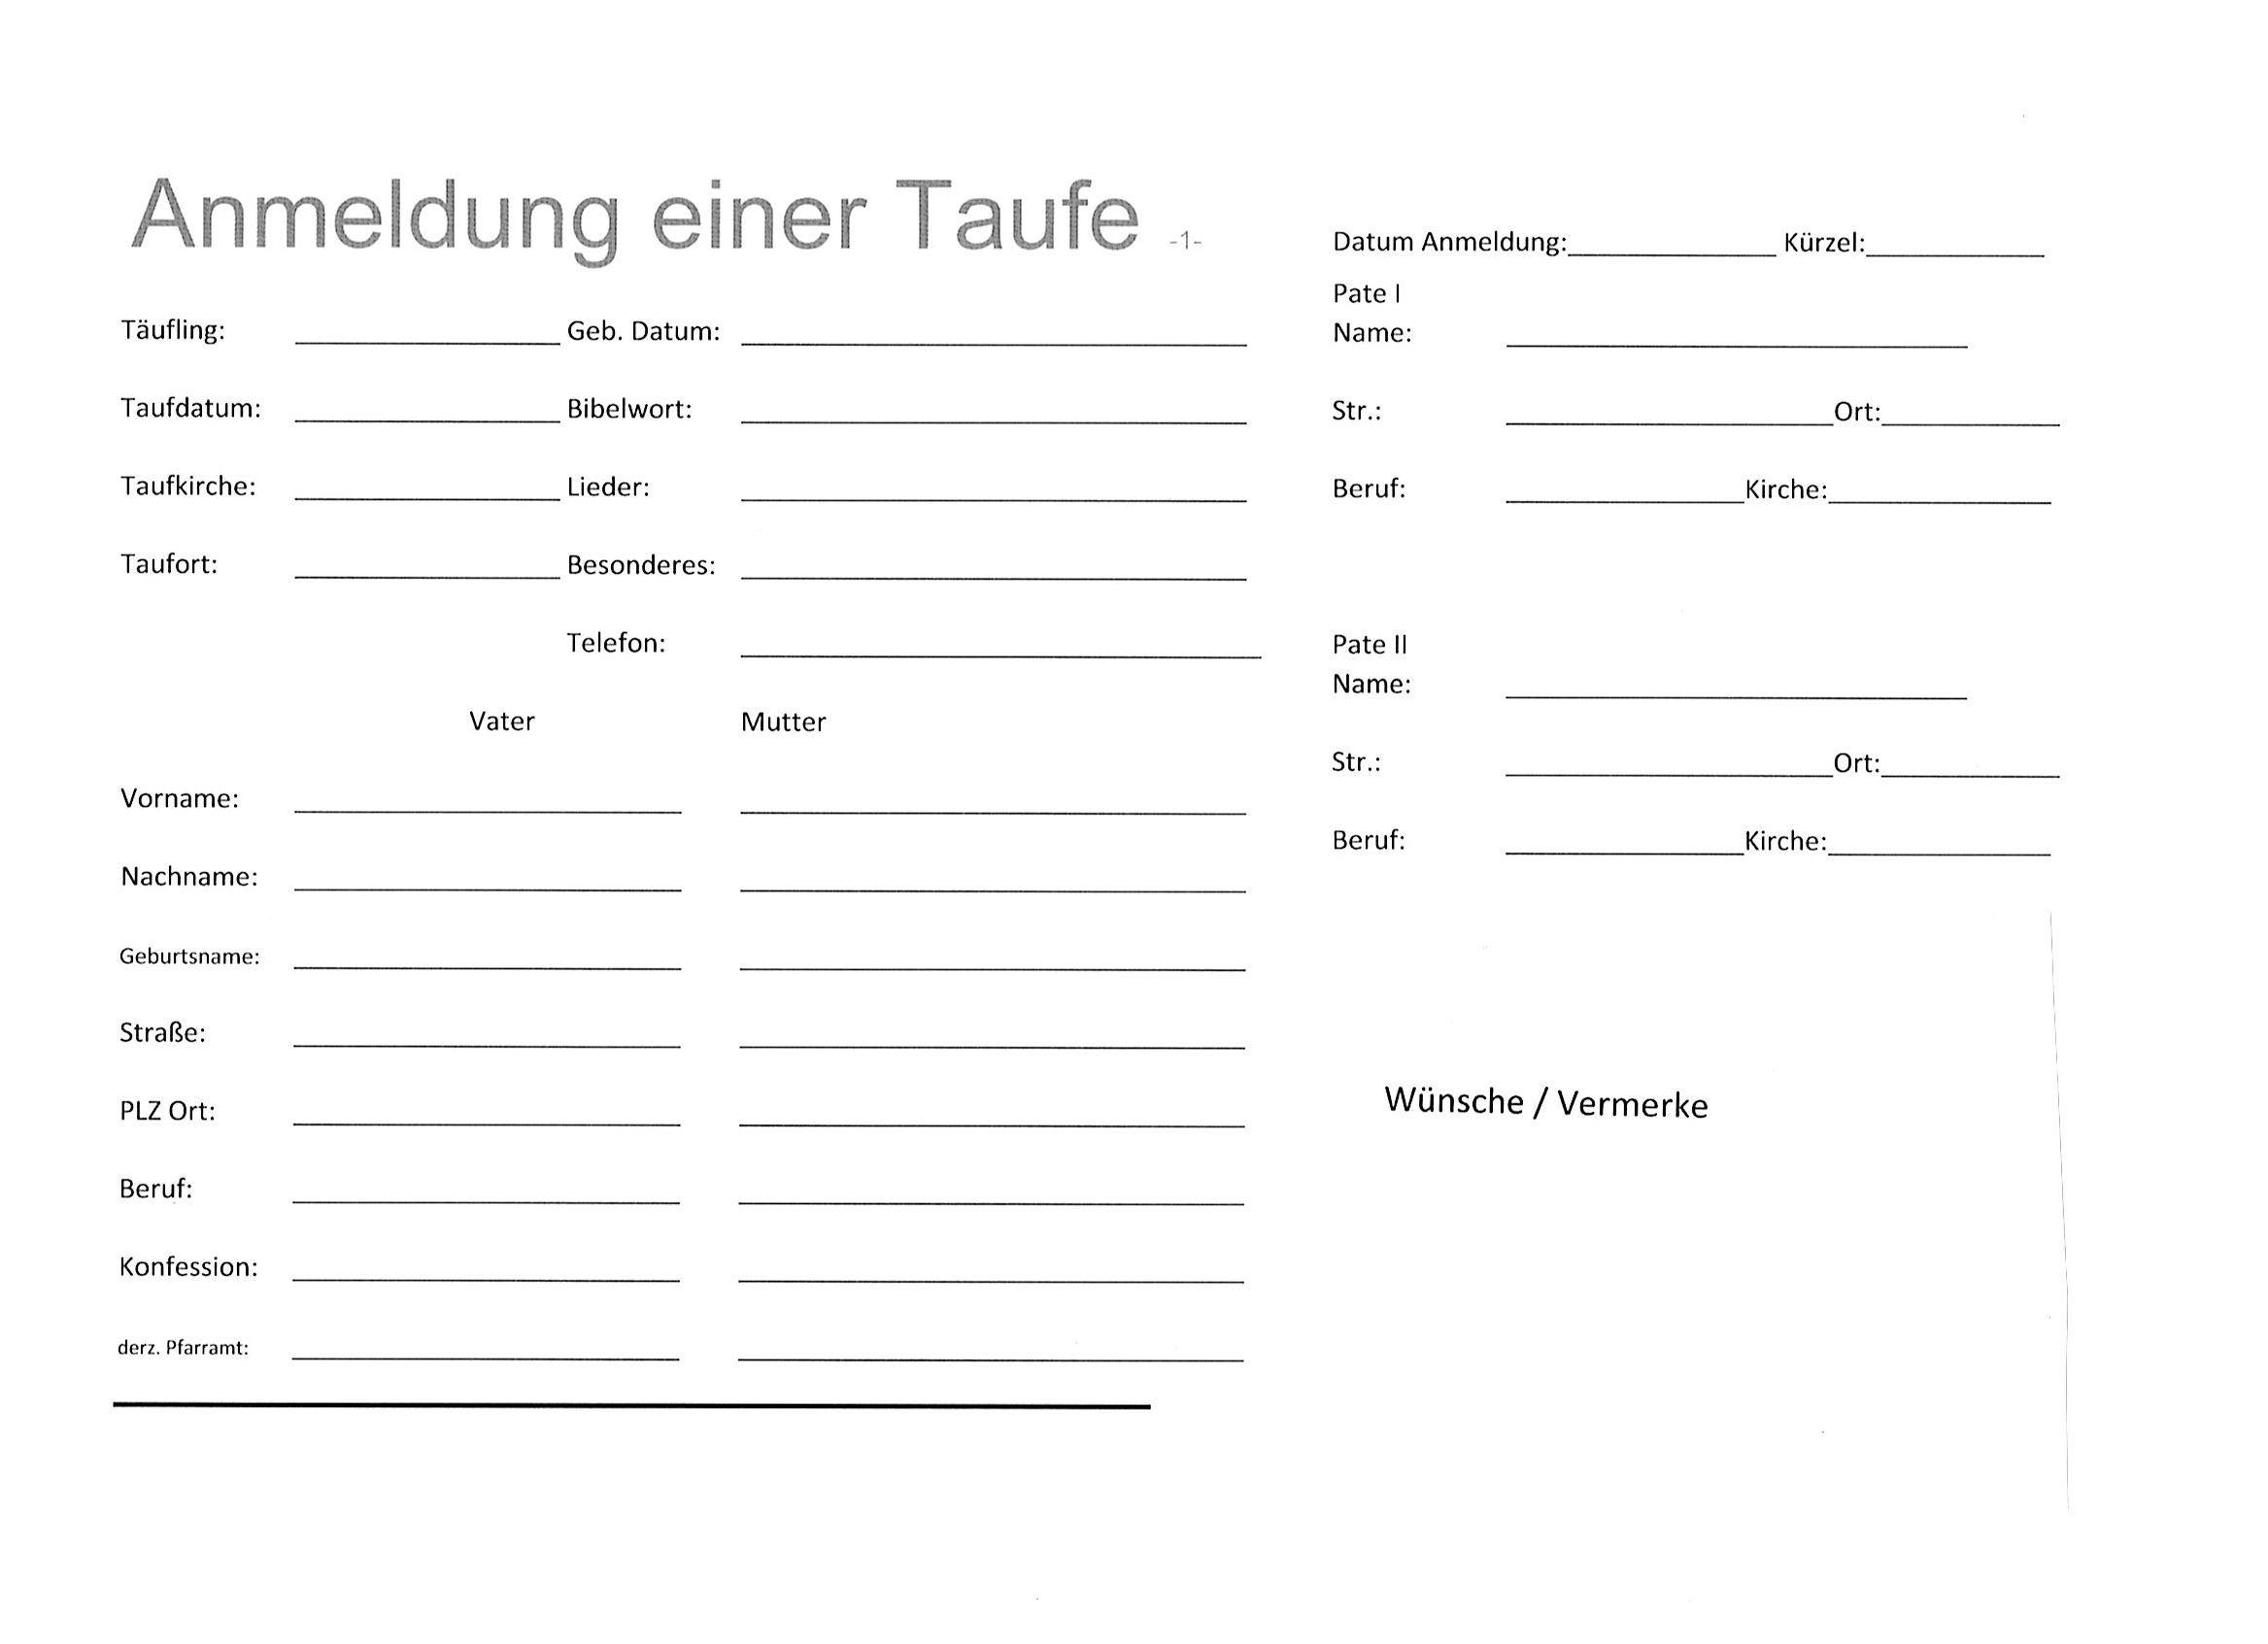 Ev Luth Kirchengemeinde Paul Gerhardt Taufe